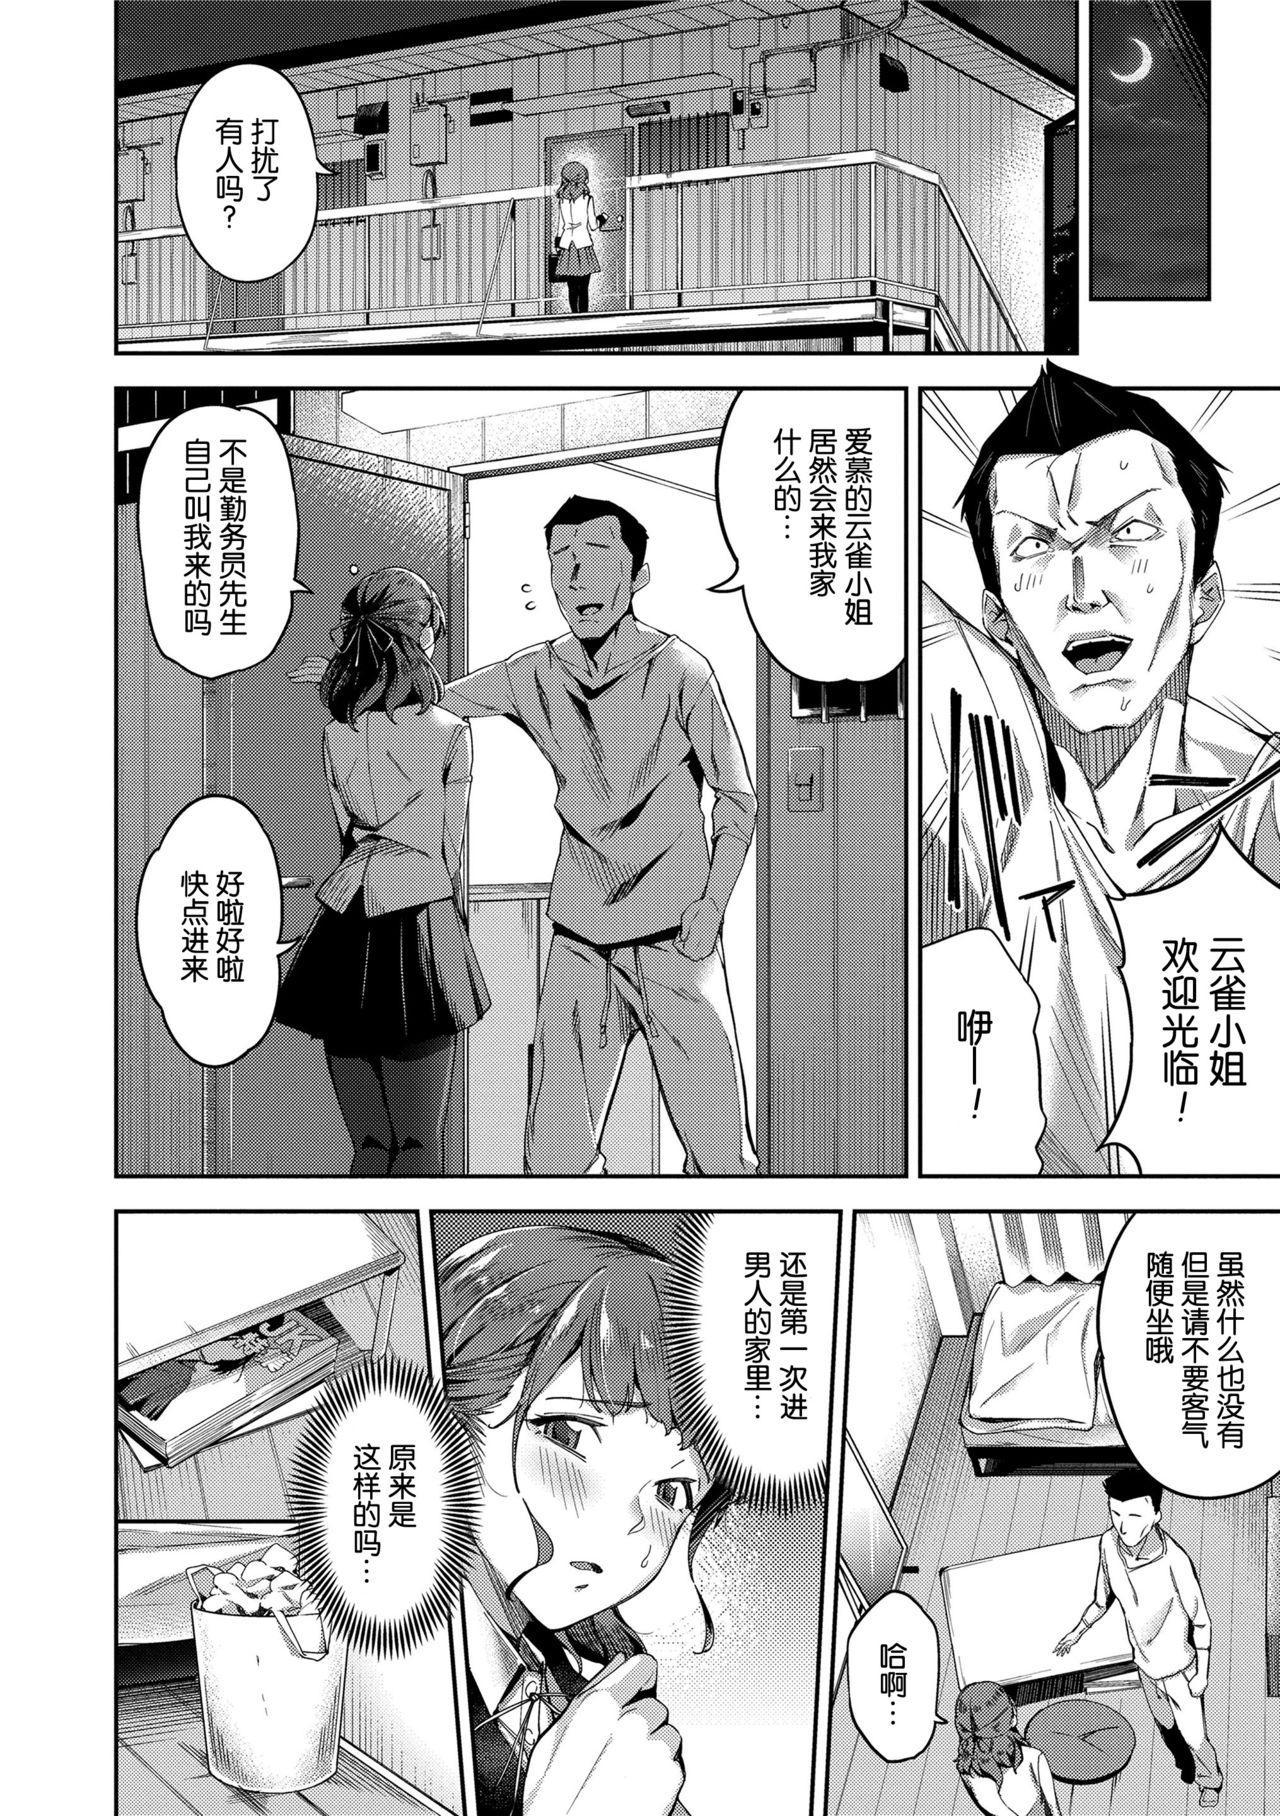 [sugarBt] Ai ga Nakutemo Ecchi wa Dekiru! - Even if There is No Love You Can H! Ch. 1-2 [Chinese] [Decensored] 21